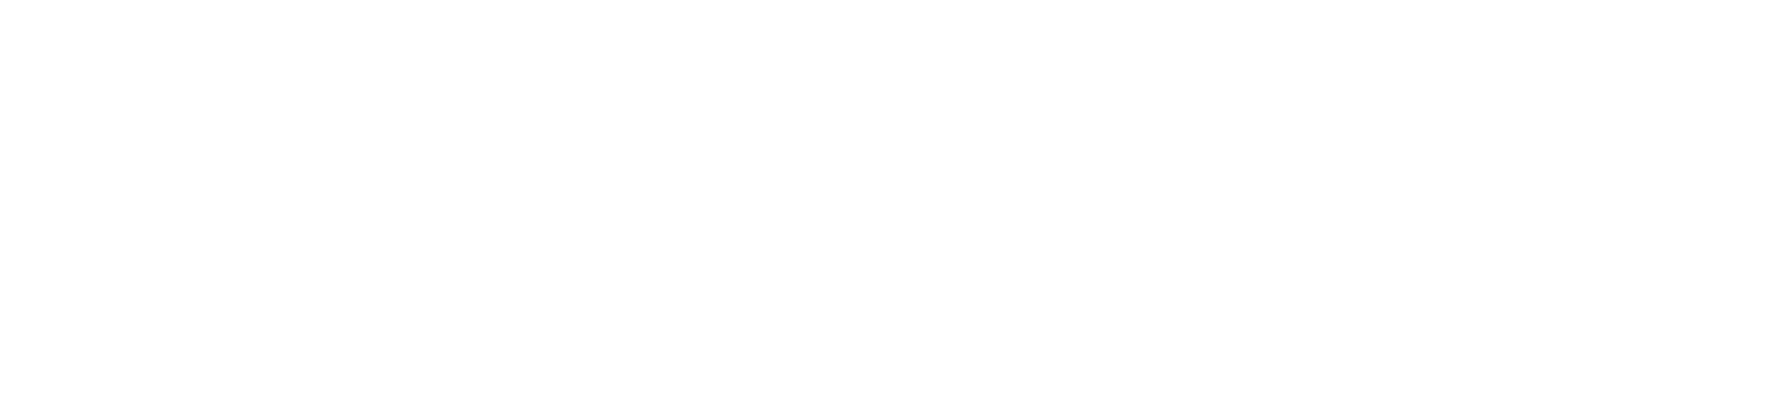 logo-honda-narita-rj-2d